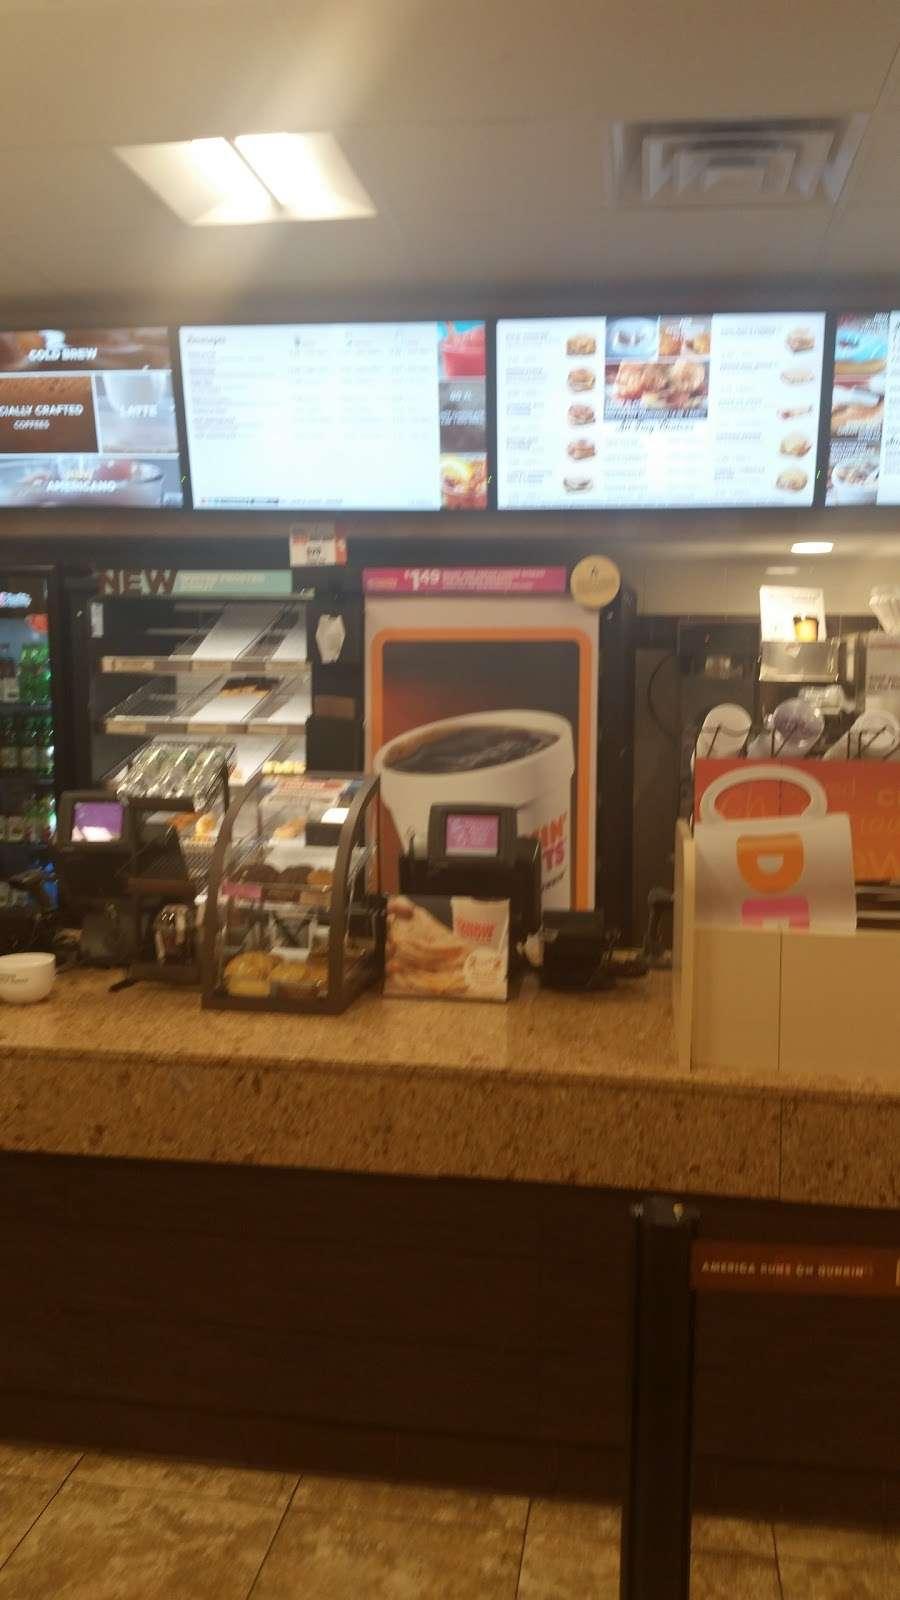 Dunkin Donuts - cafe  | Photo 3 of 10 | Address: 8301 Flatlands Ave, Brooklyn, NY 11236, USA | Phone: (718) 531-4469